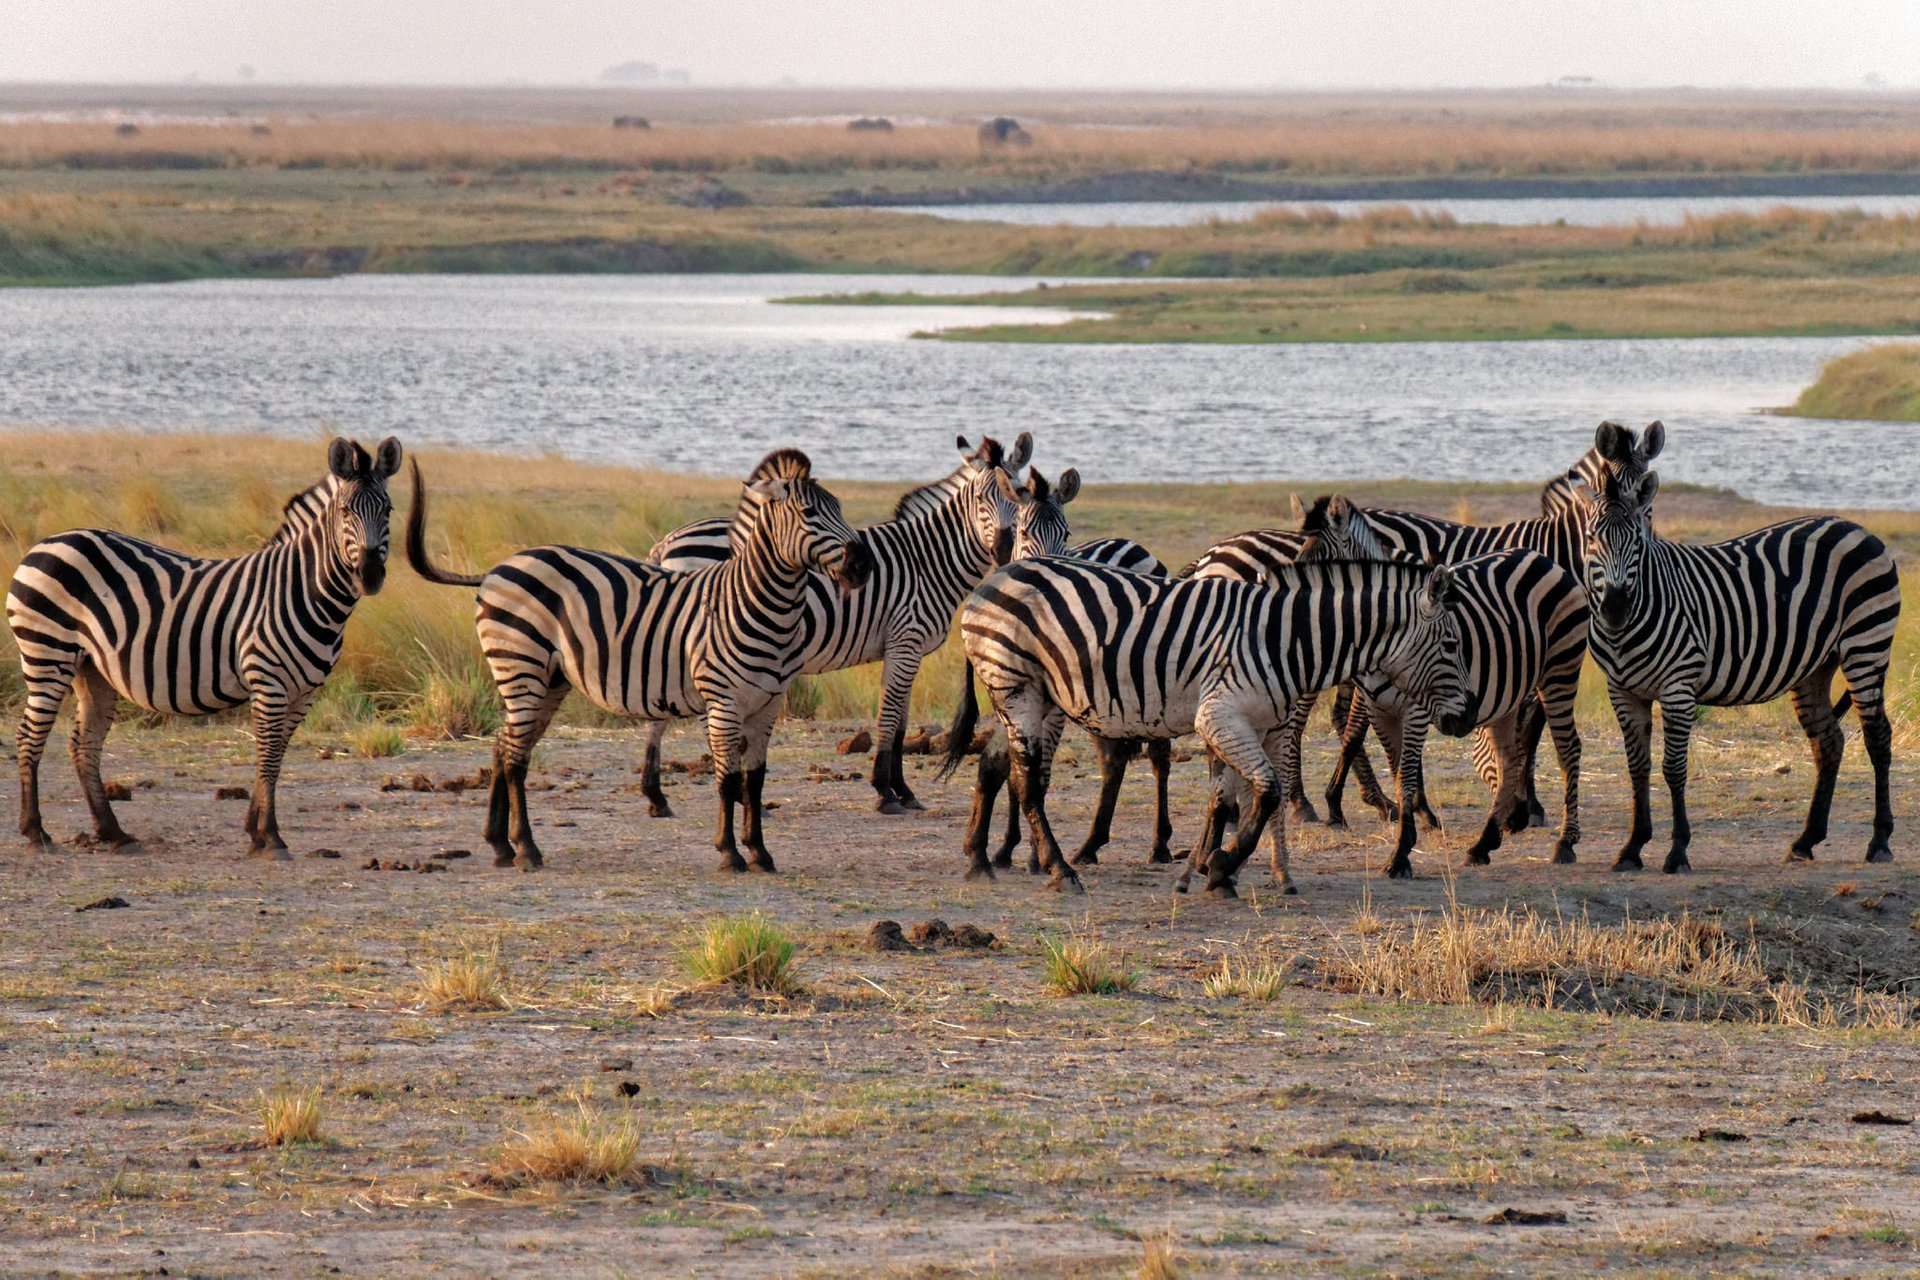 Zebras at the Chobe River, Botswana 2020